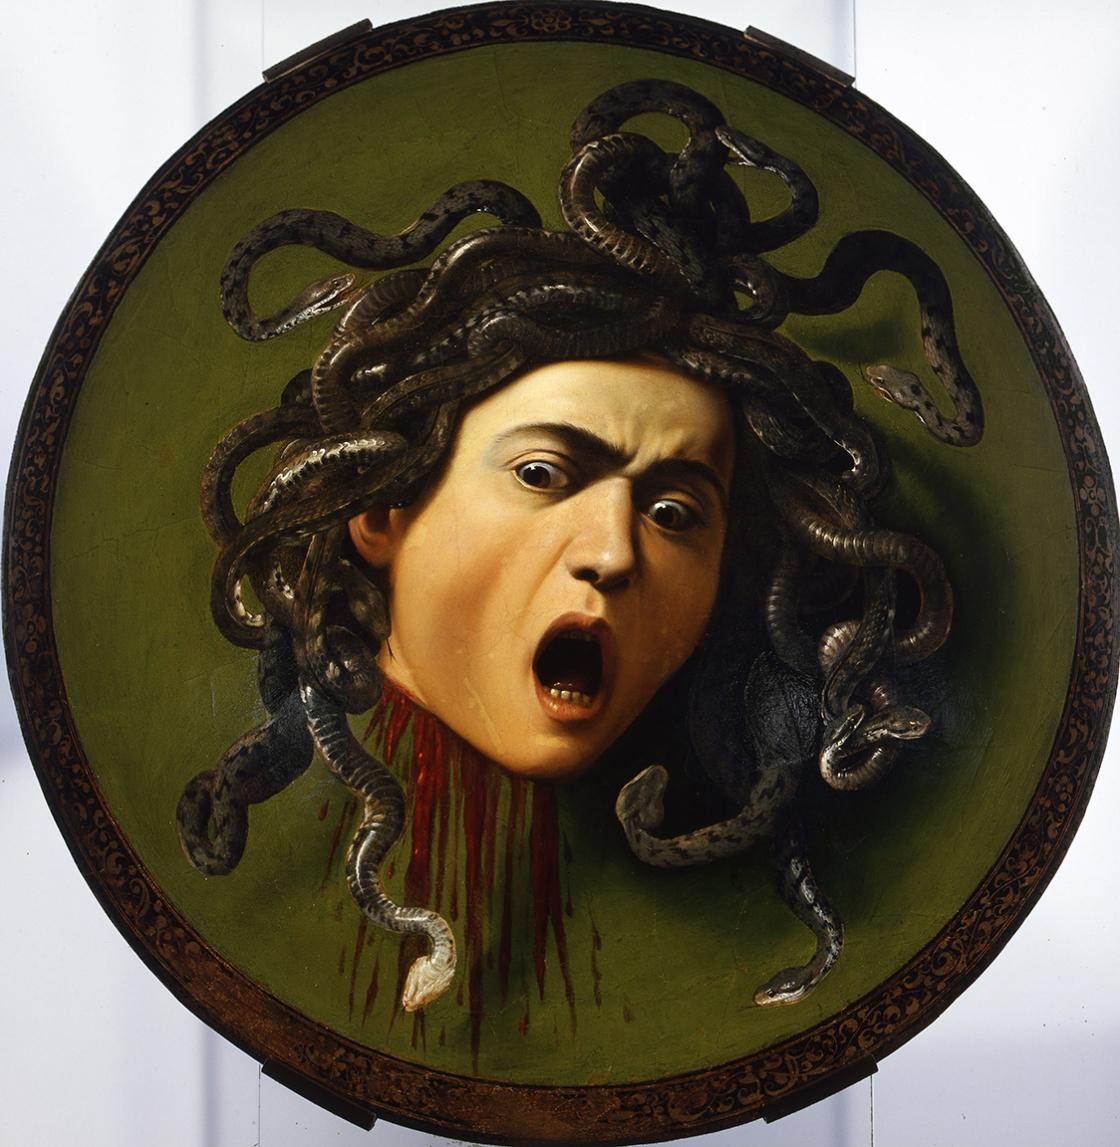 Caravaggio_-_Medusa_-_Google_Art_Project copy